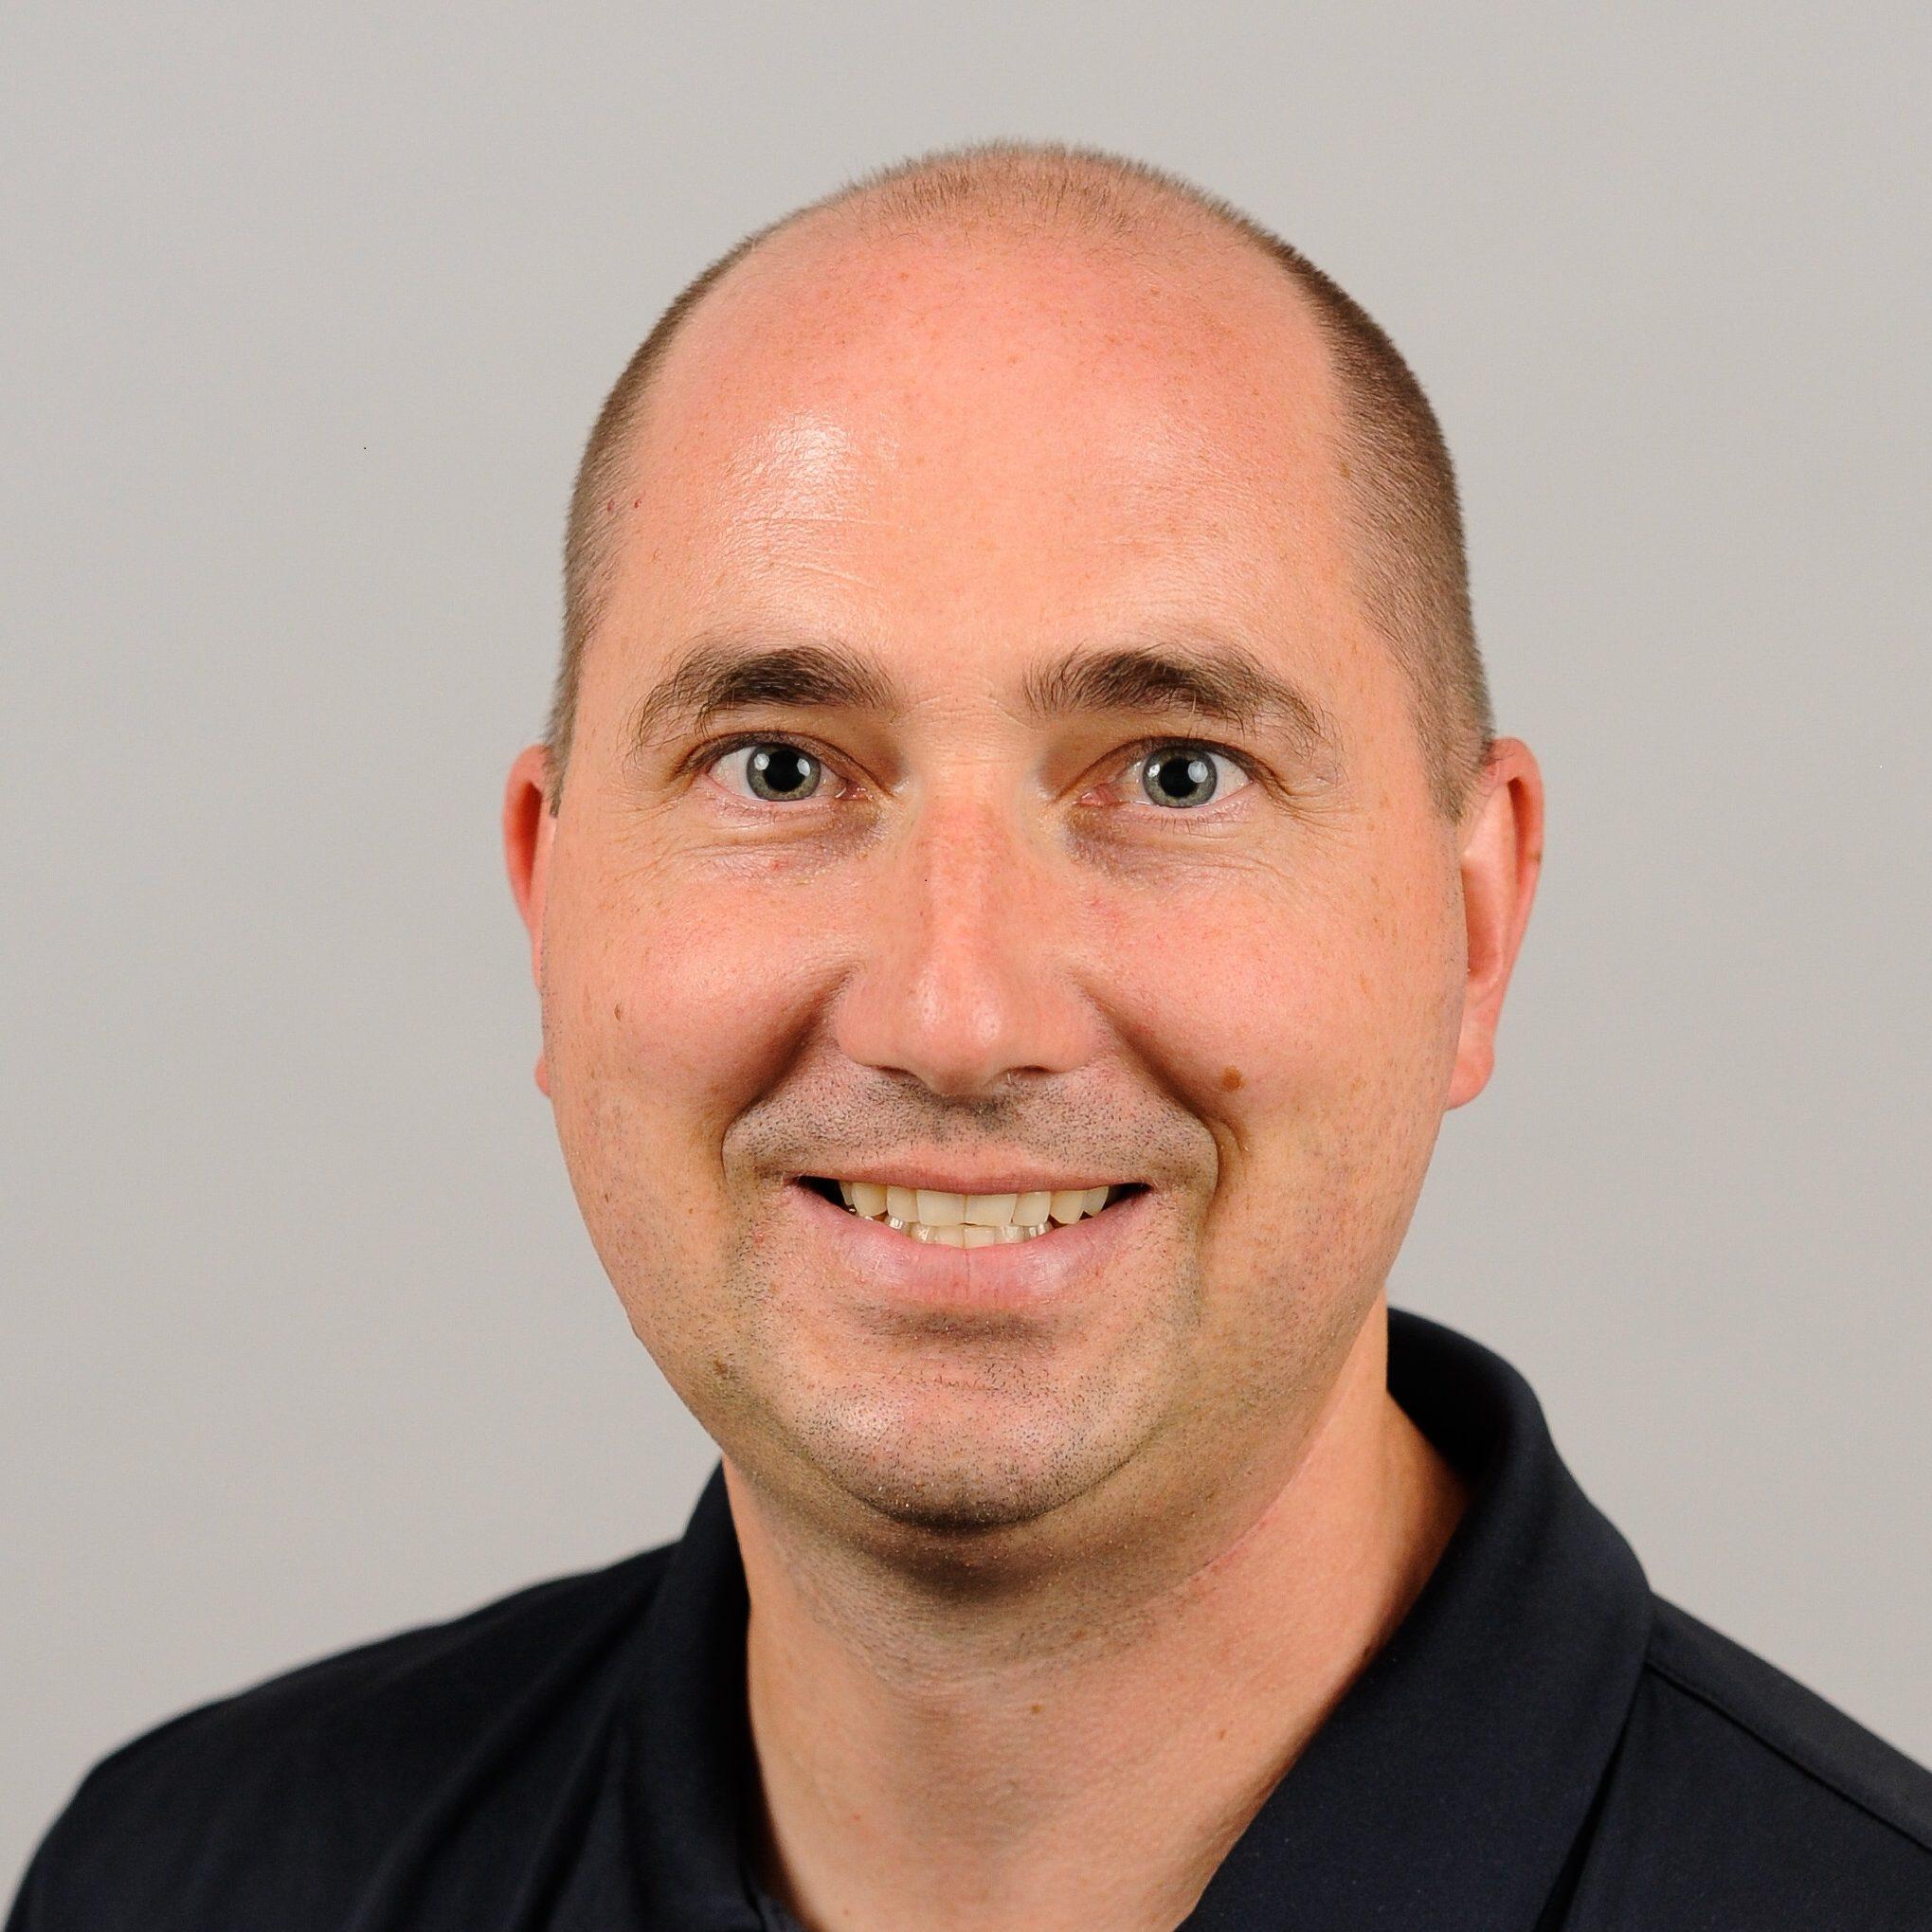 Dr. Kyle Susa - Headshot